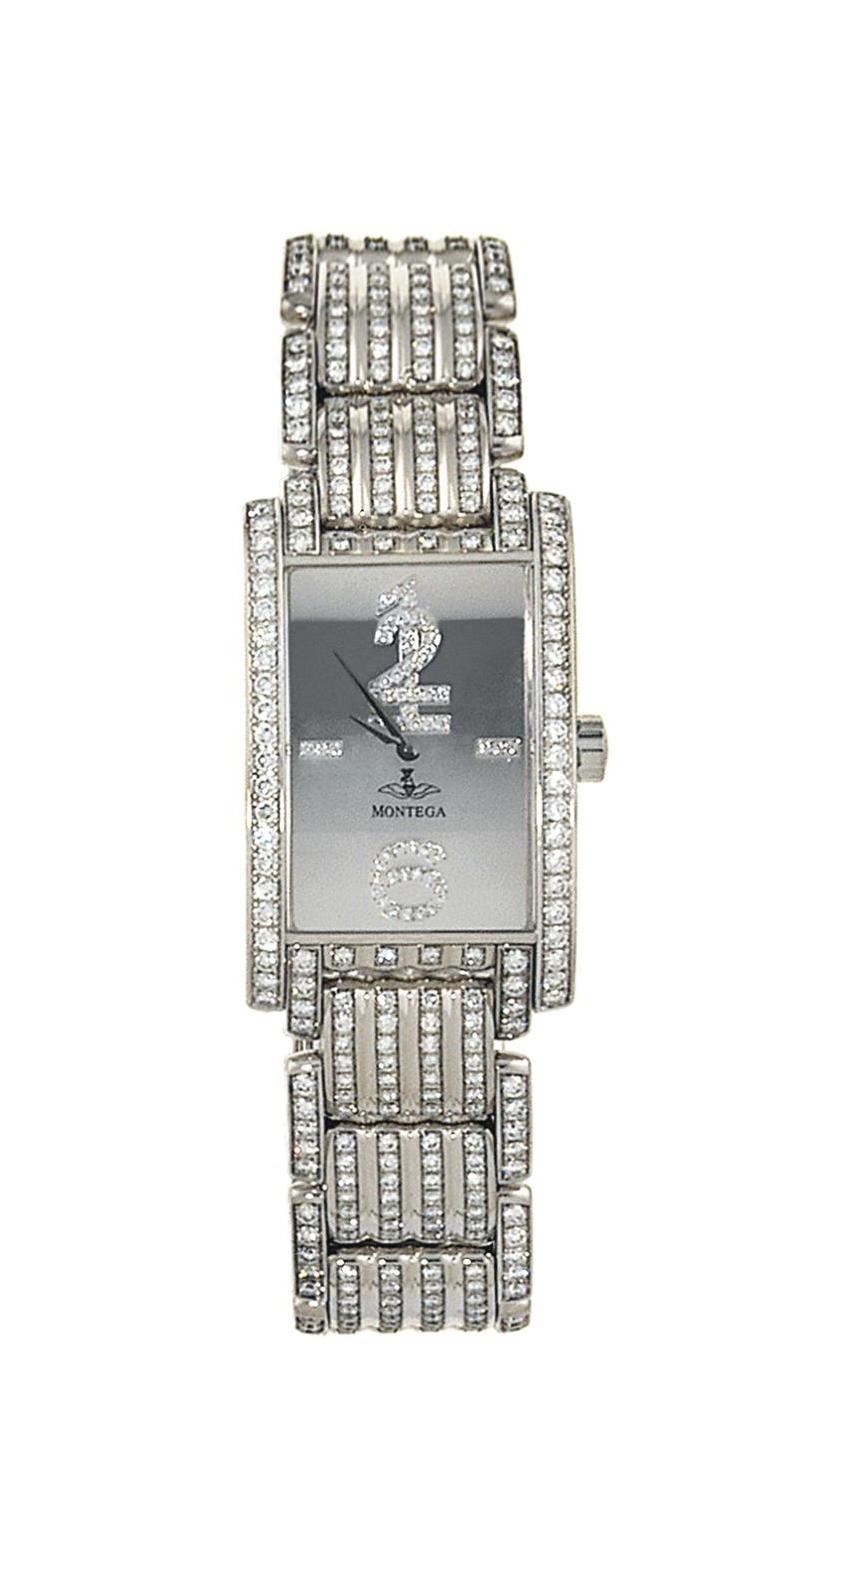 An 18ct white gold and diamond quartz wristwatch, by Montega